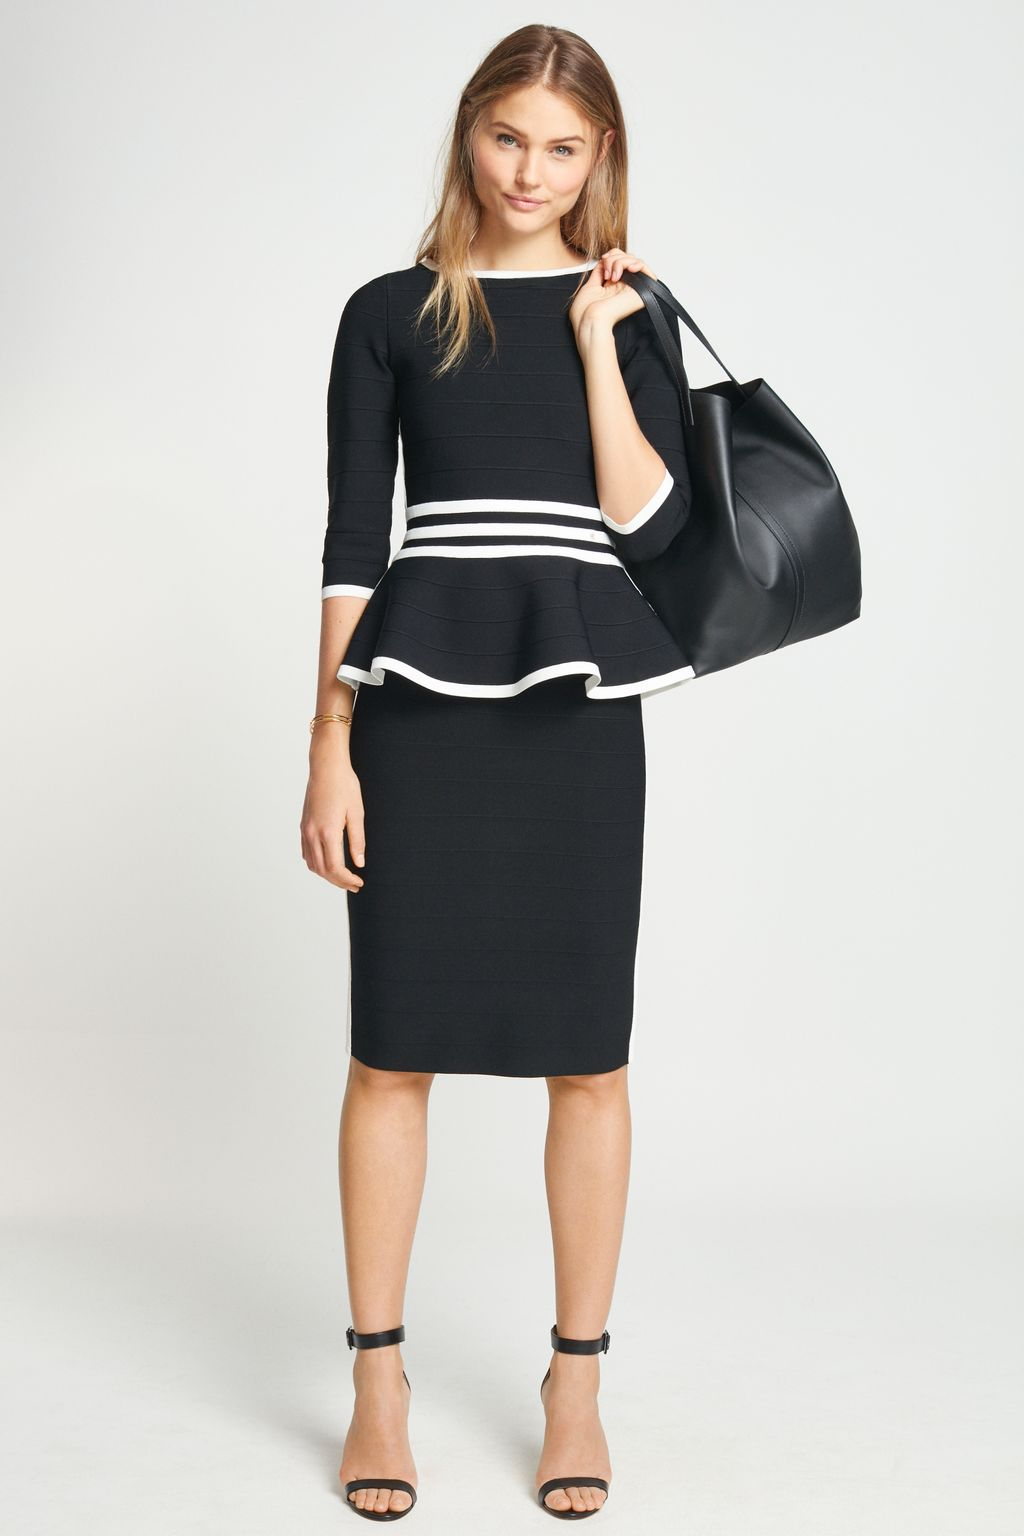 Stretch-knit skirt with stripes